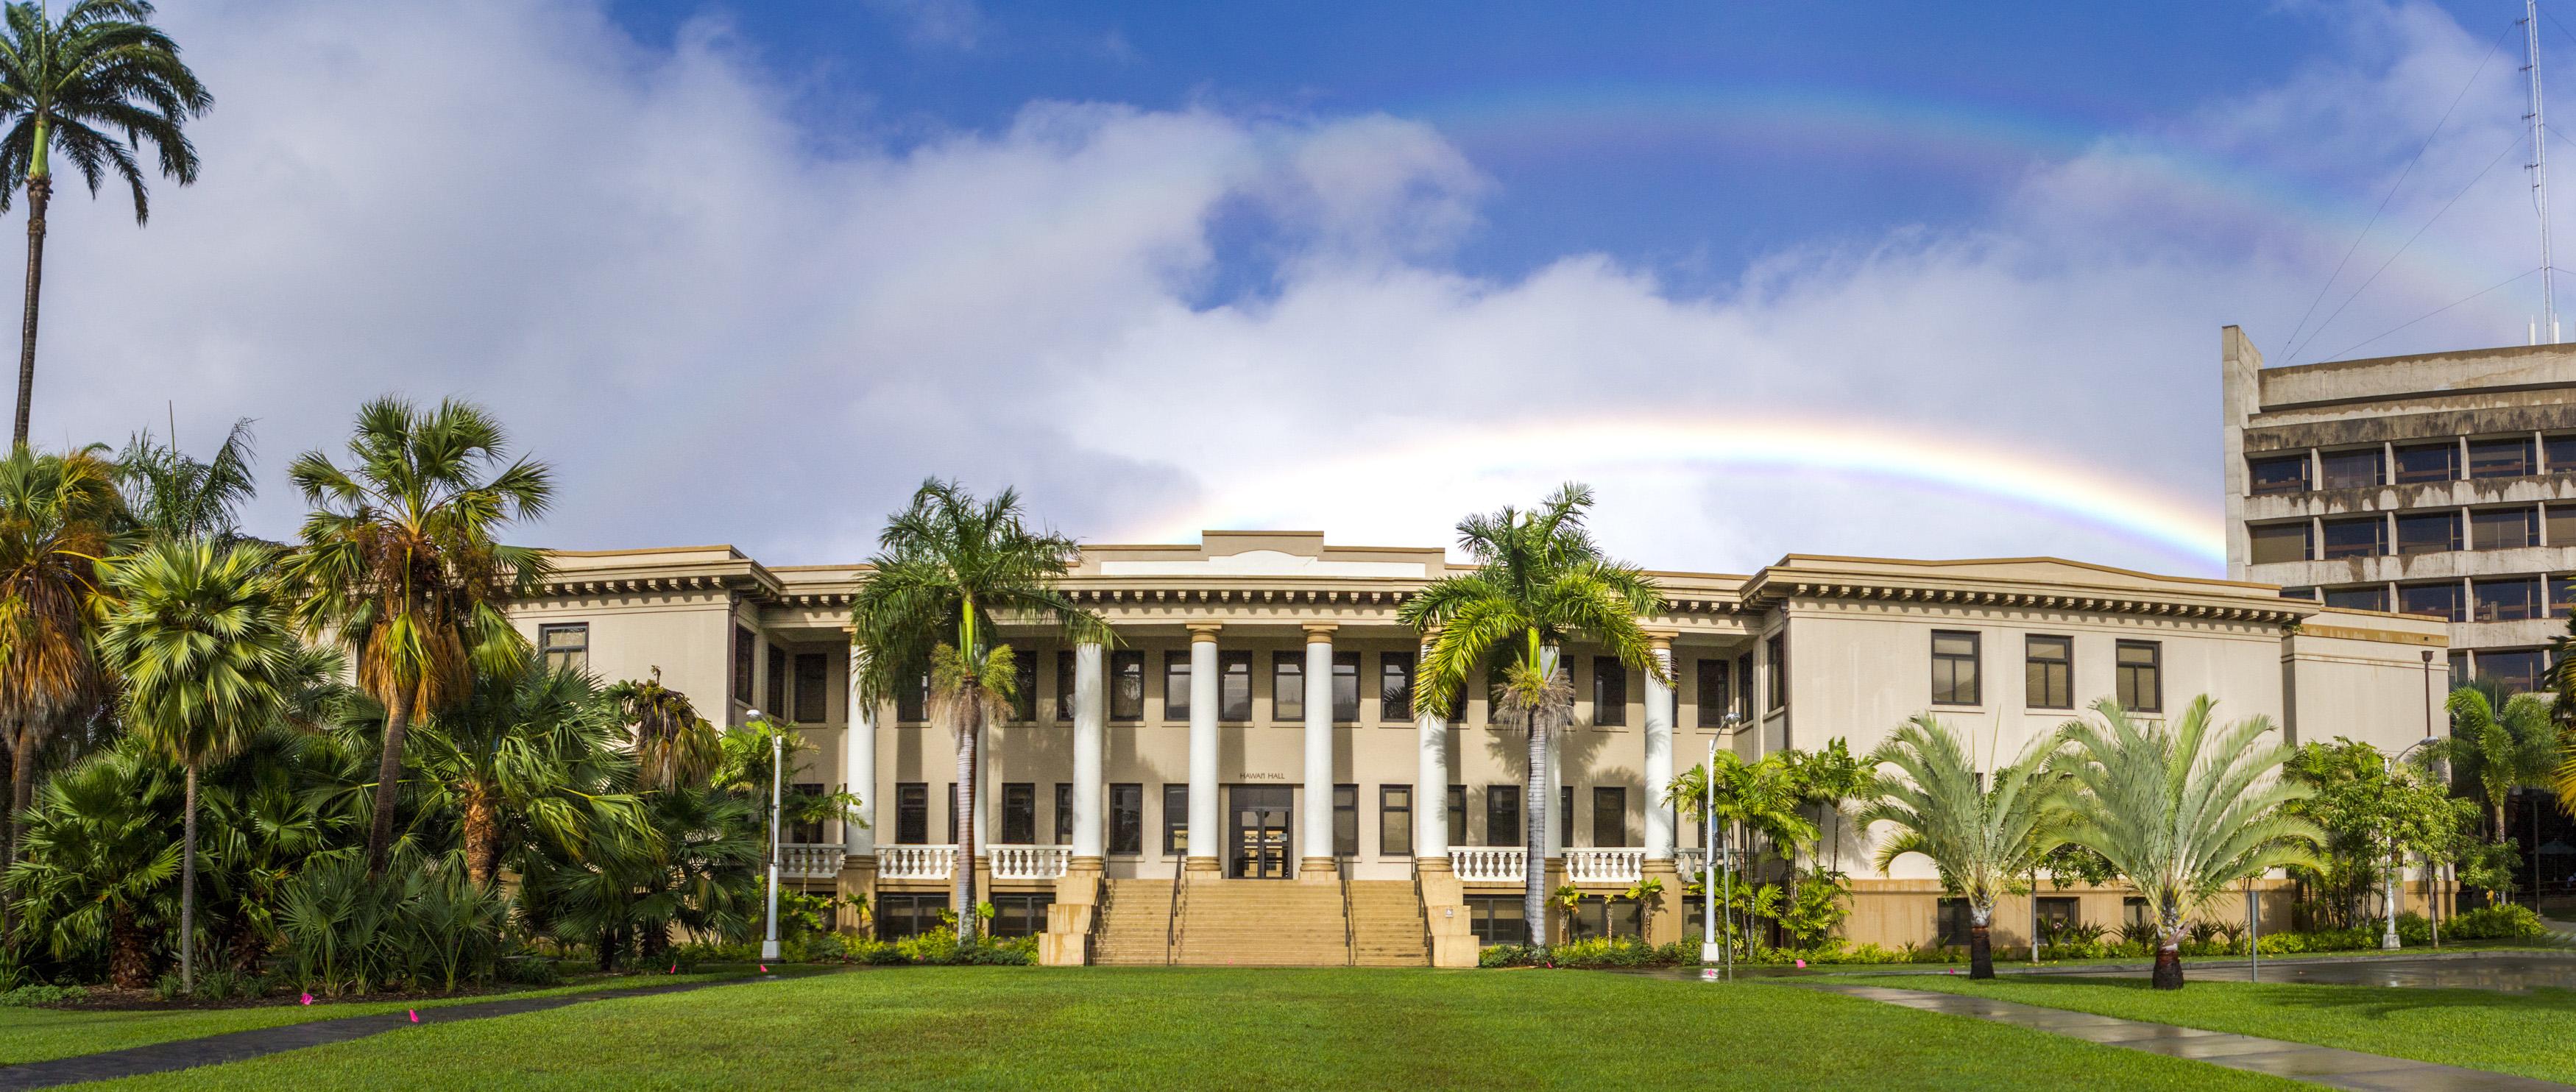 Double rainbow over Hawaii Hall and palm trees